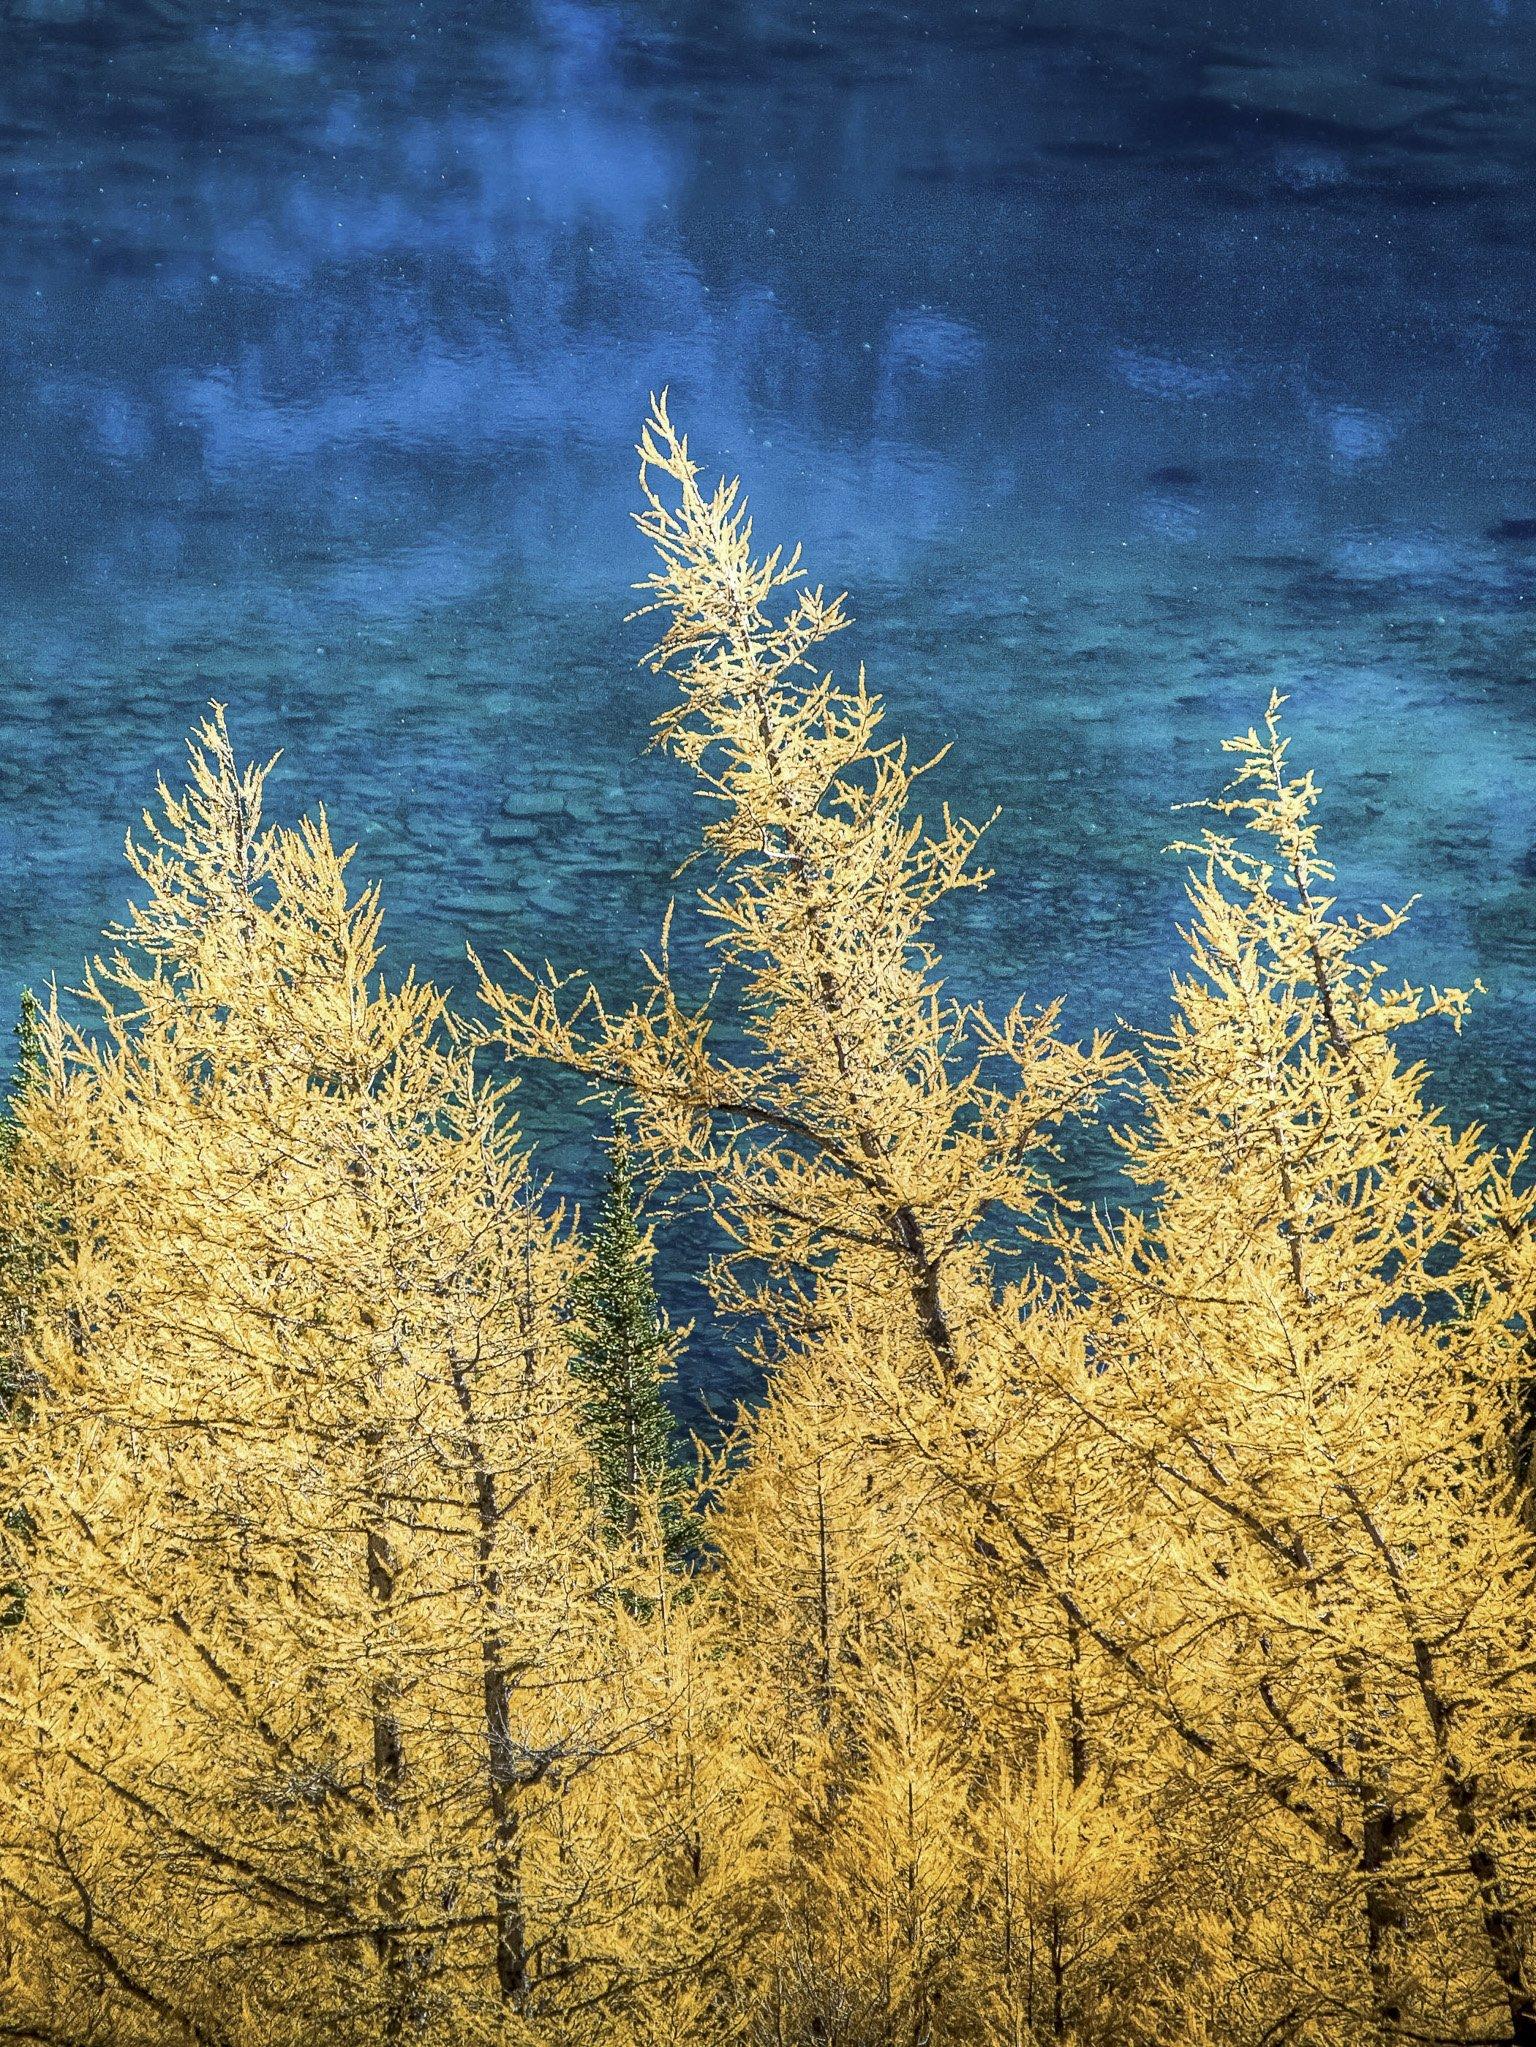 Wallpaper - Autumn Contrast - Paul Zizka Photography